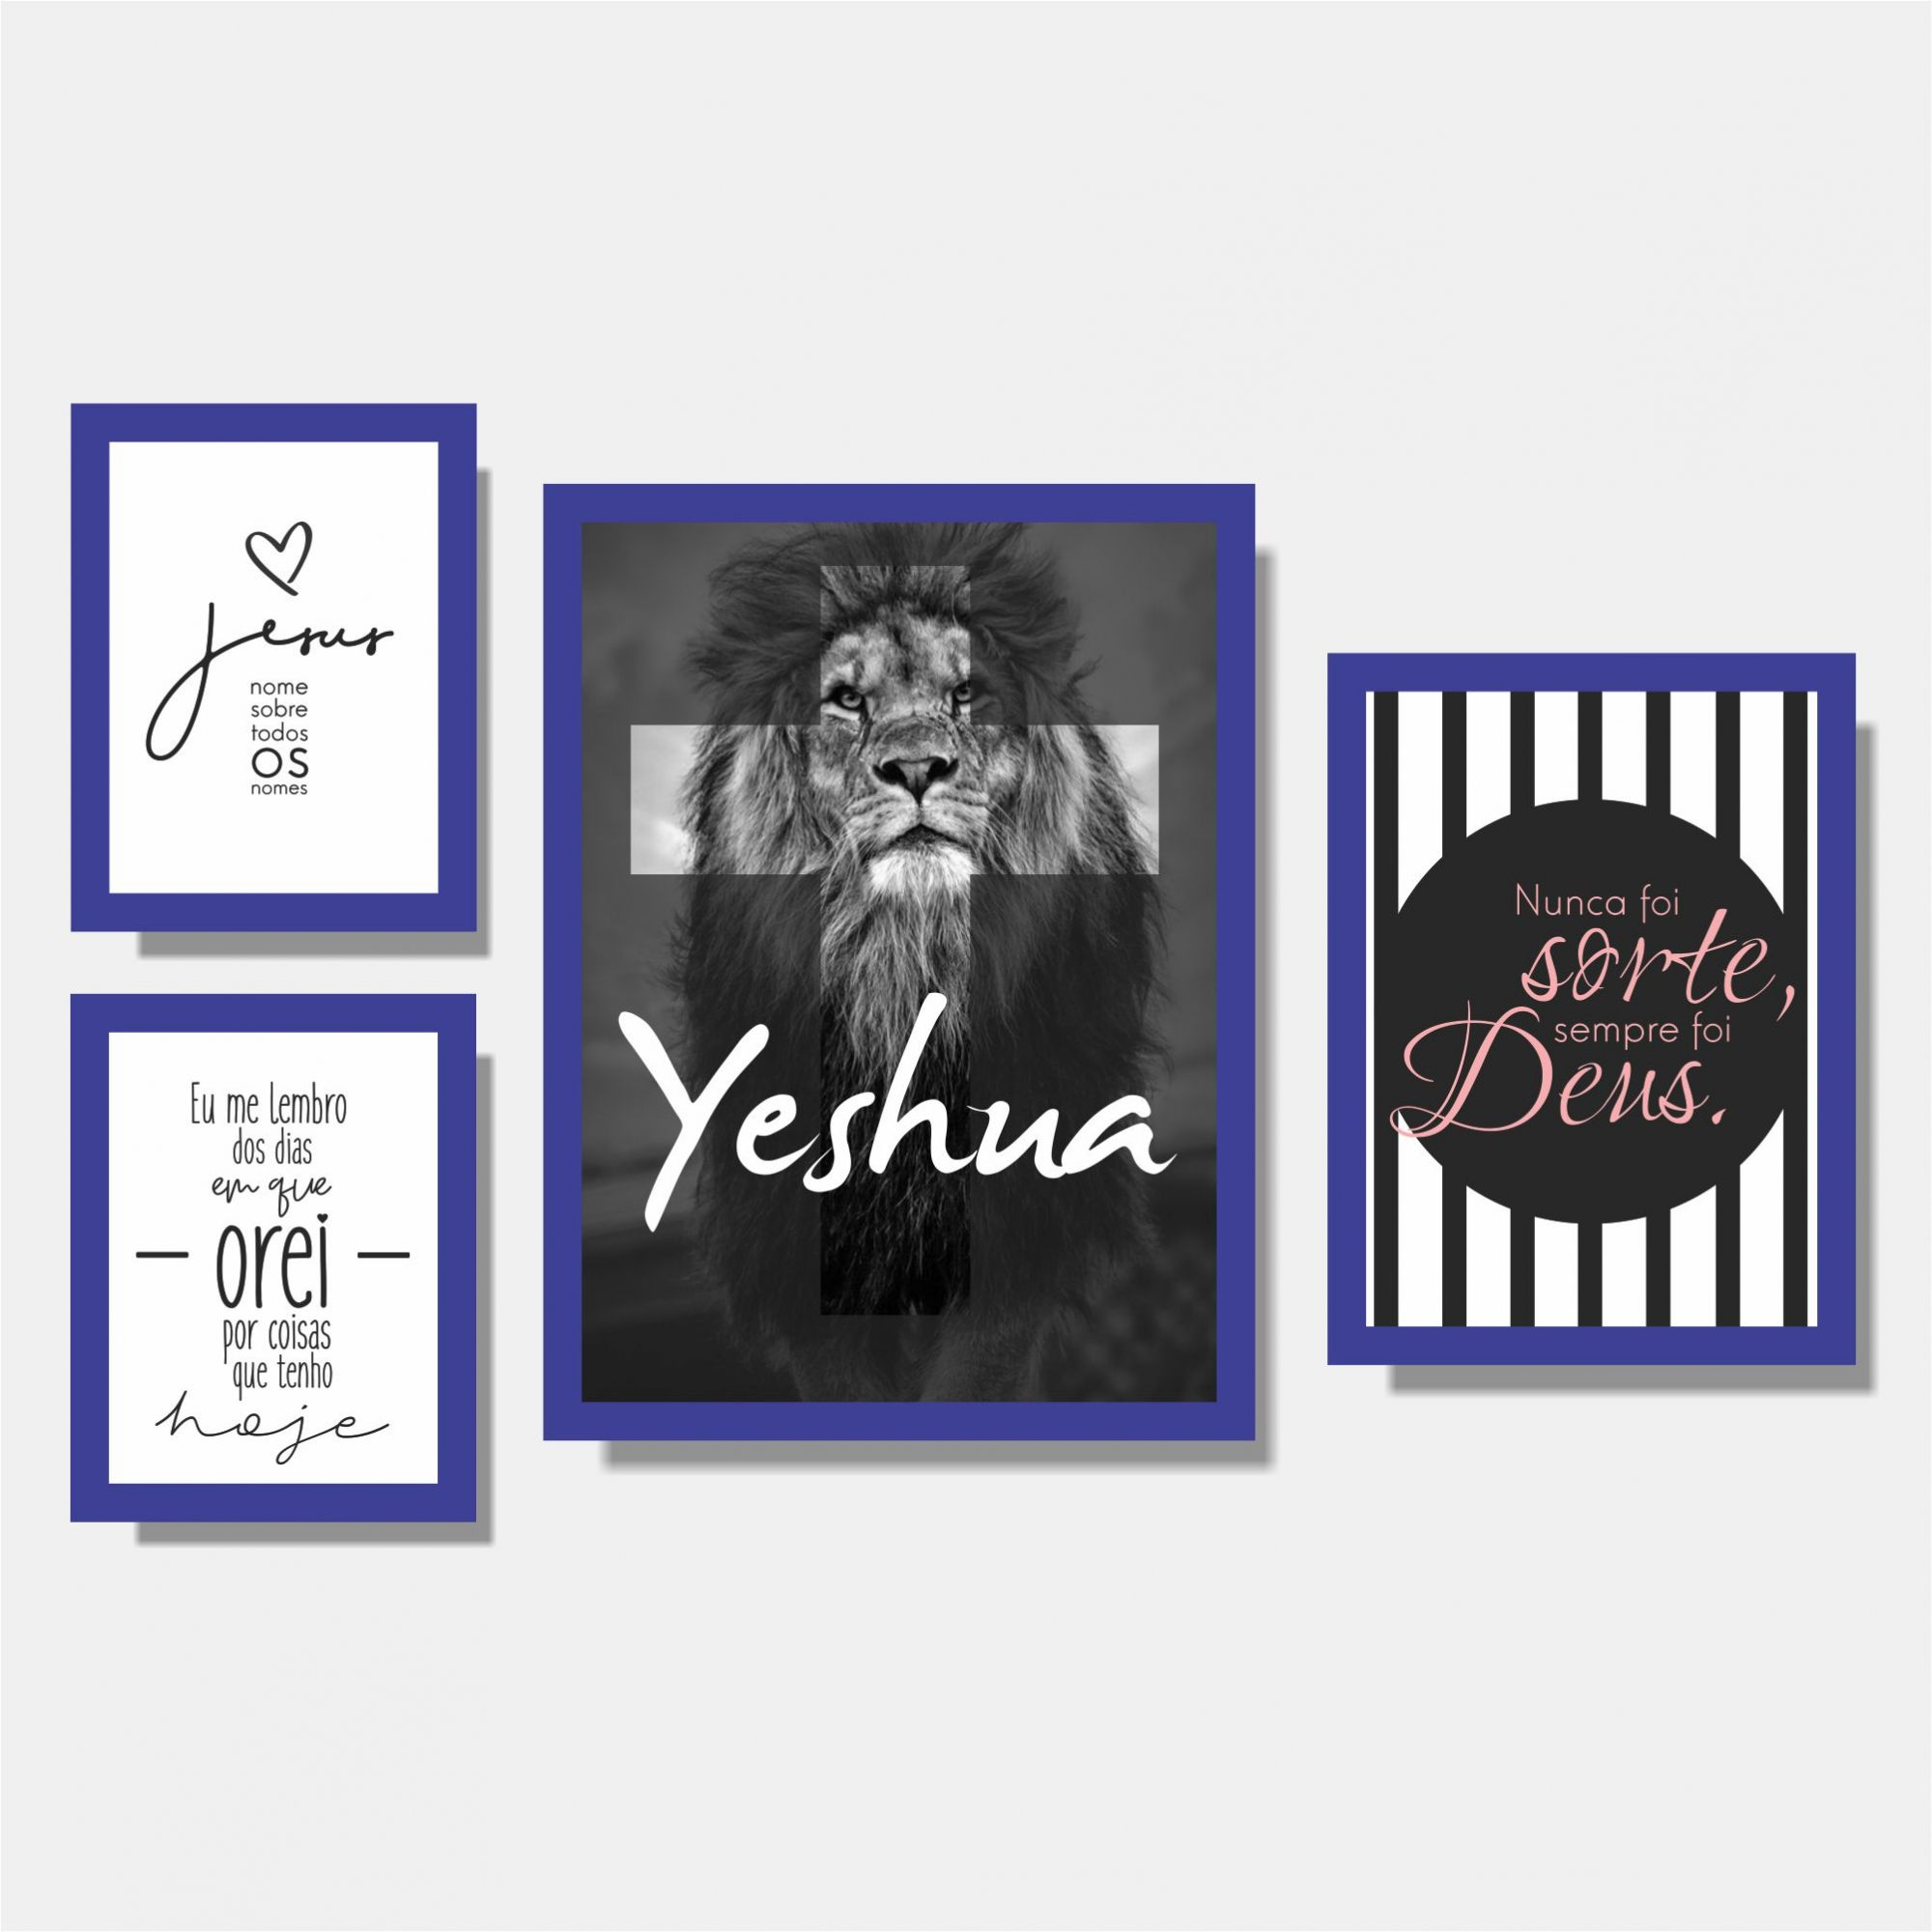 Kit Yeshua + Jesus + Nunca Foi Sorte + Eu me Lembro